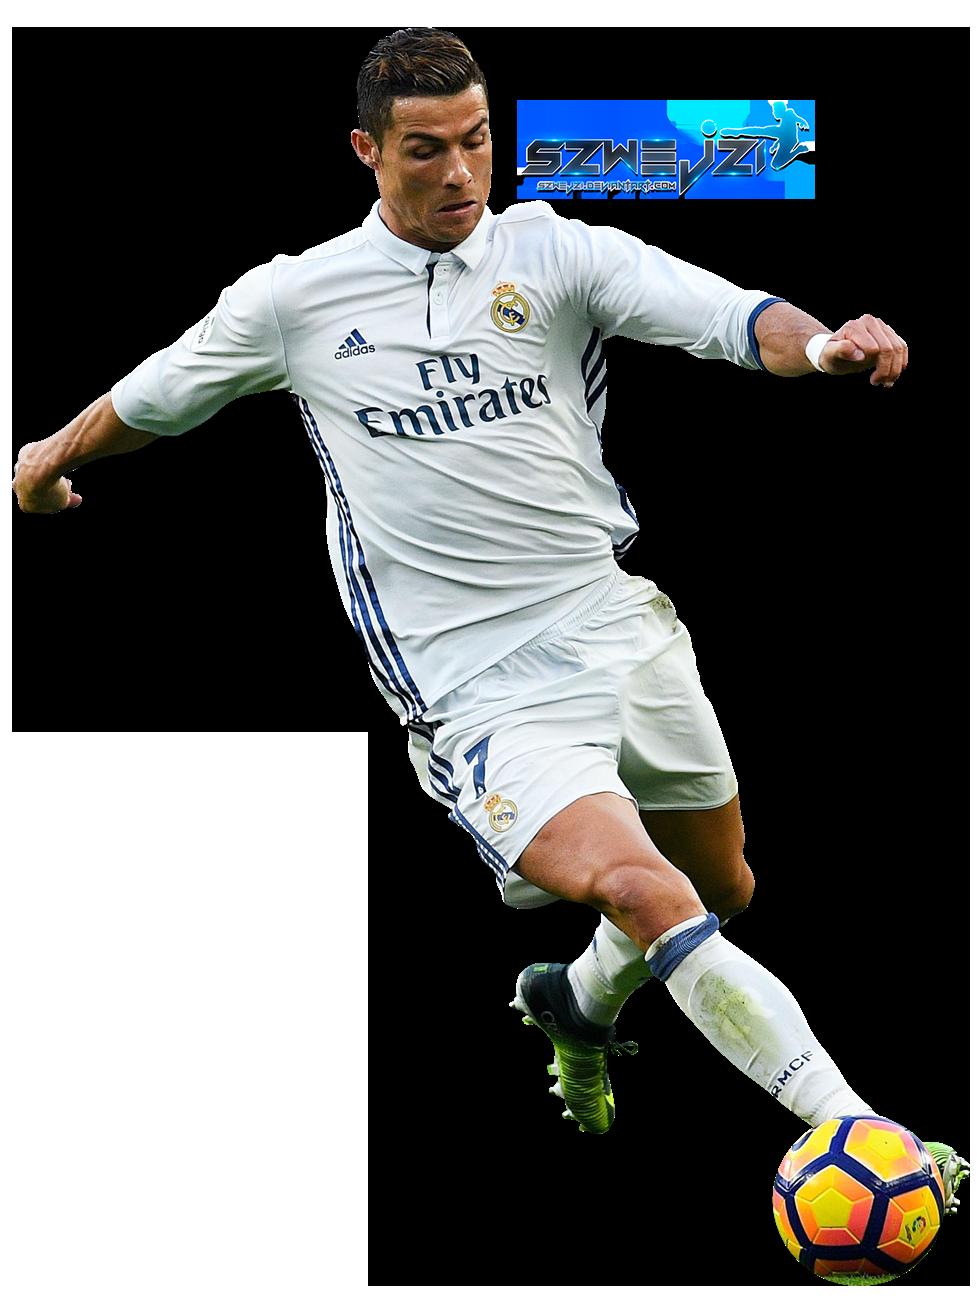 Soccer clipart ronaldo Cristiano szwejzi Ronaldo on szwejzi